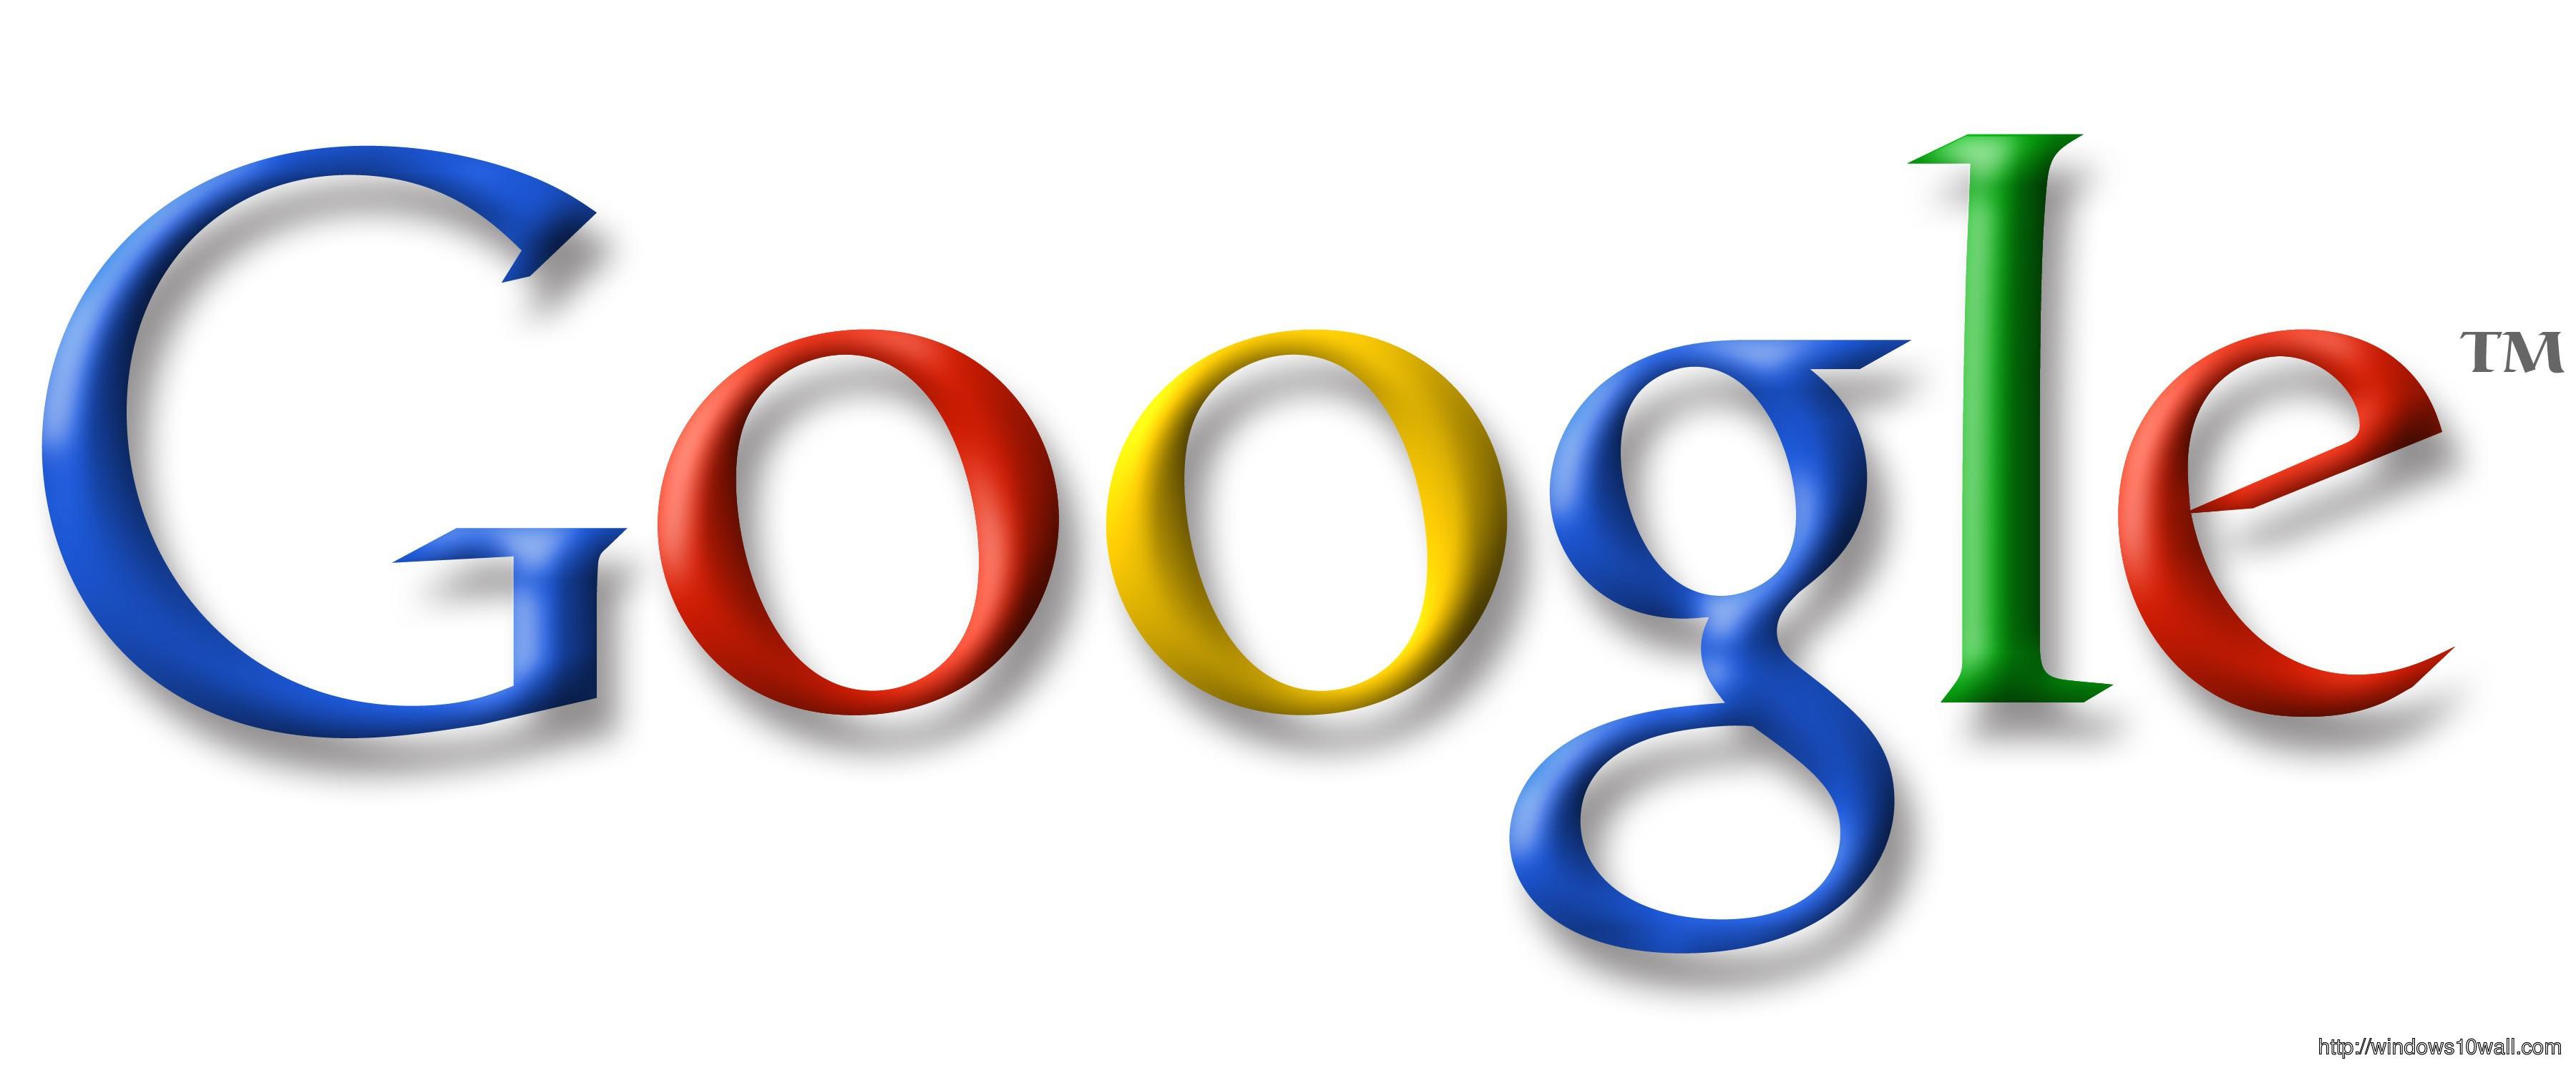 Google Logo Background Wallpaper